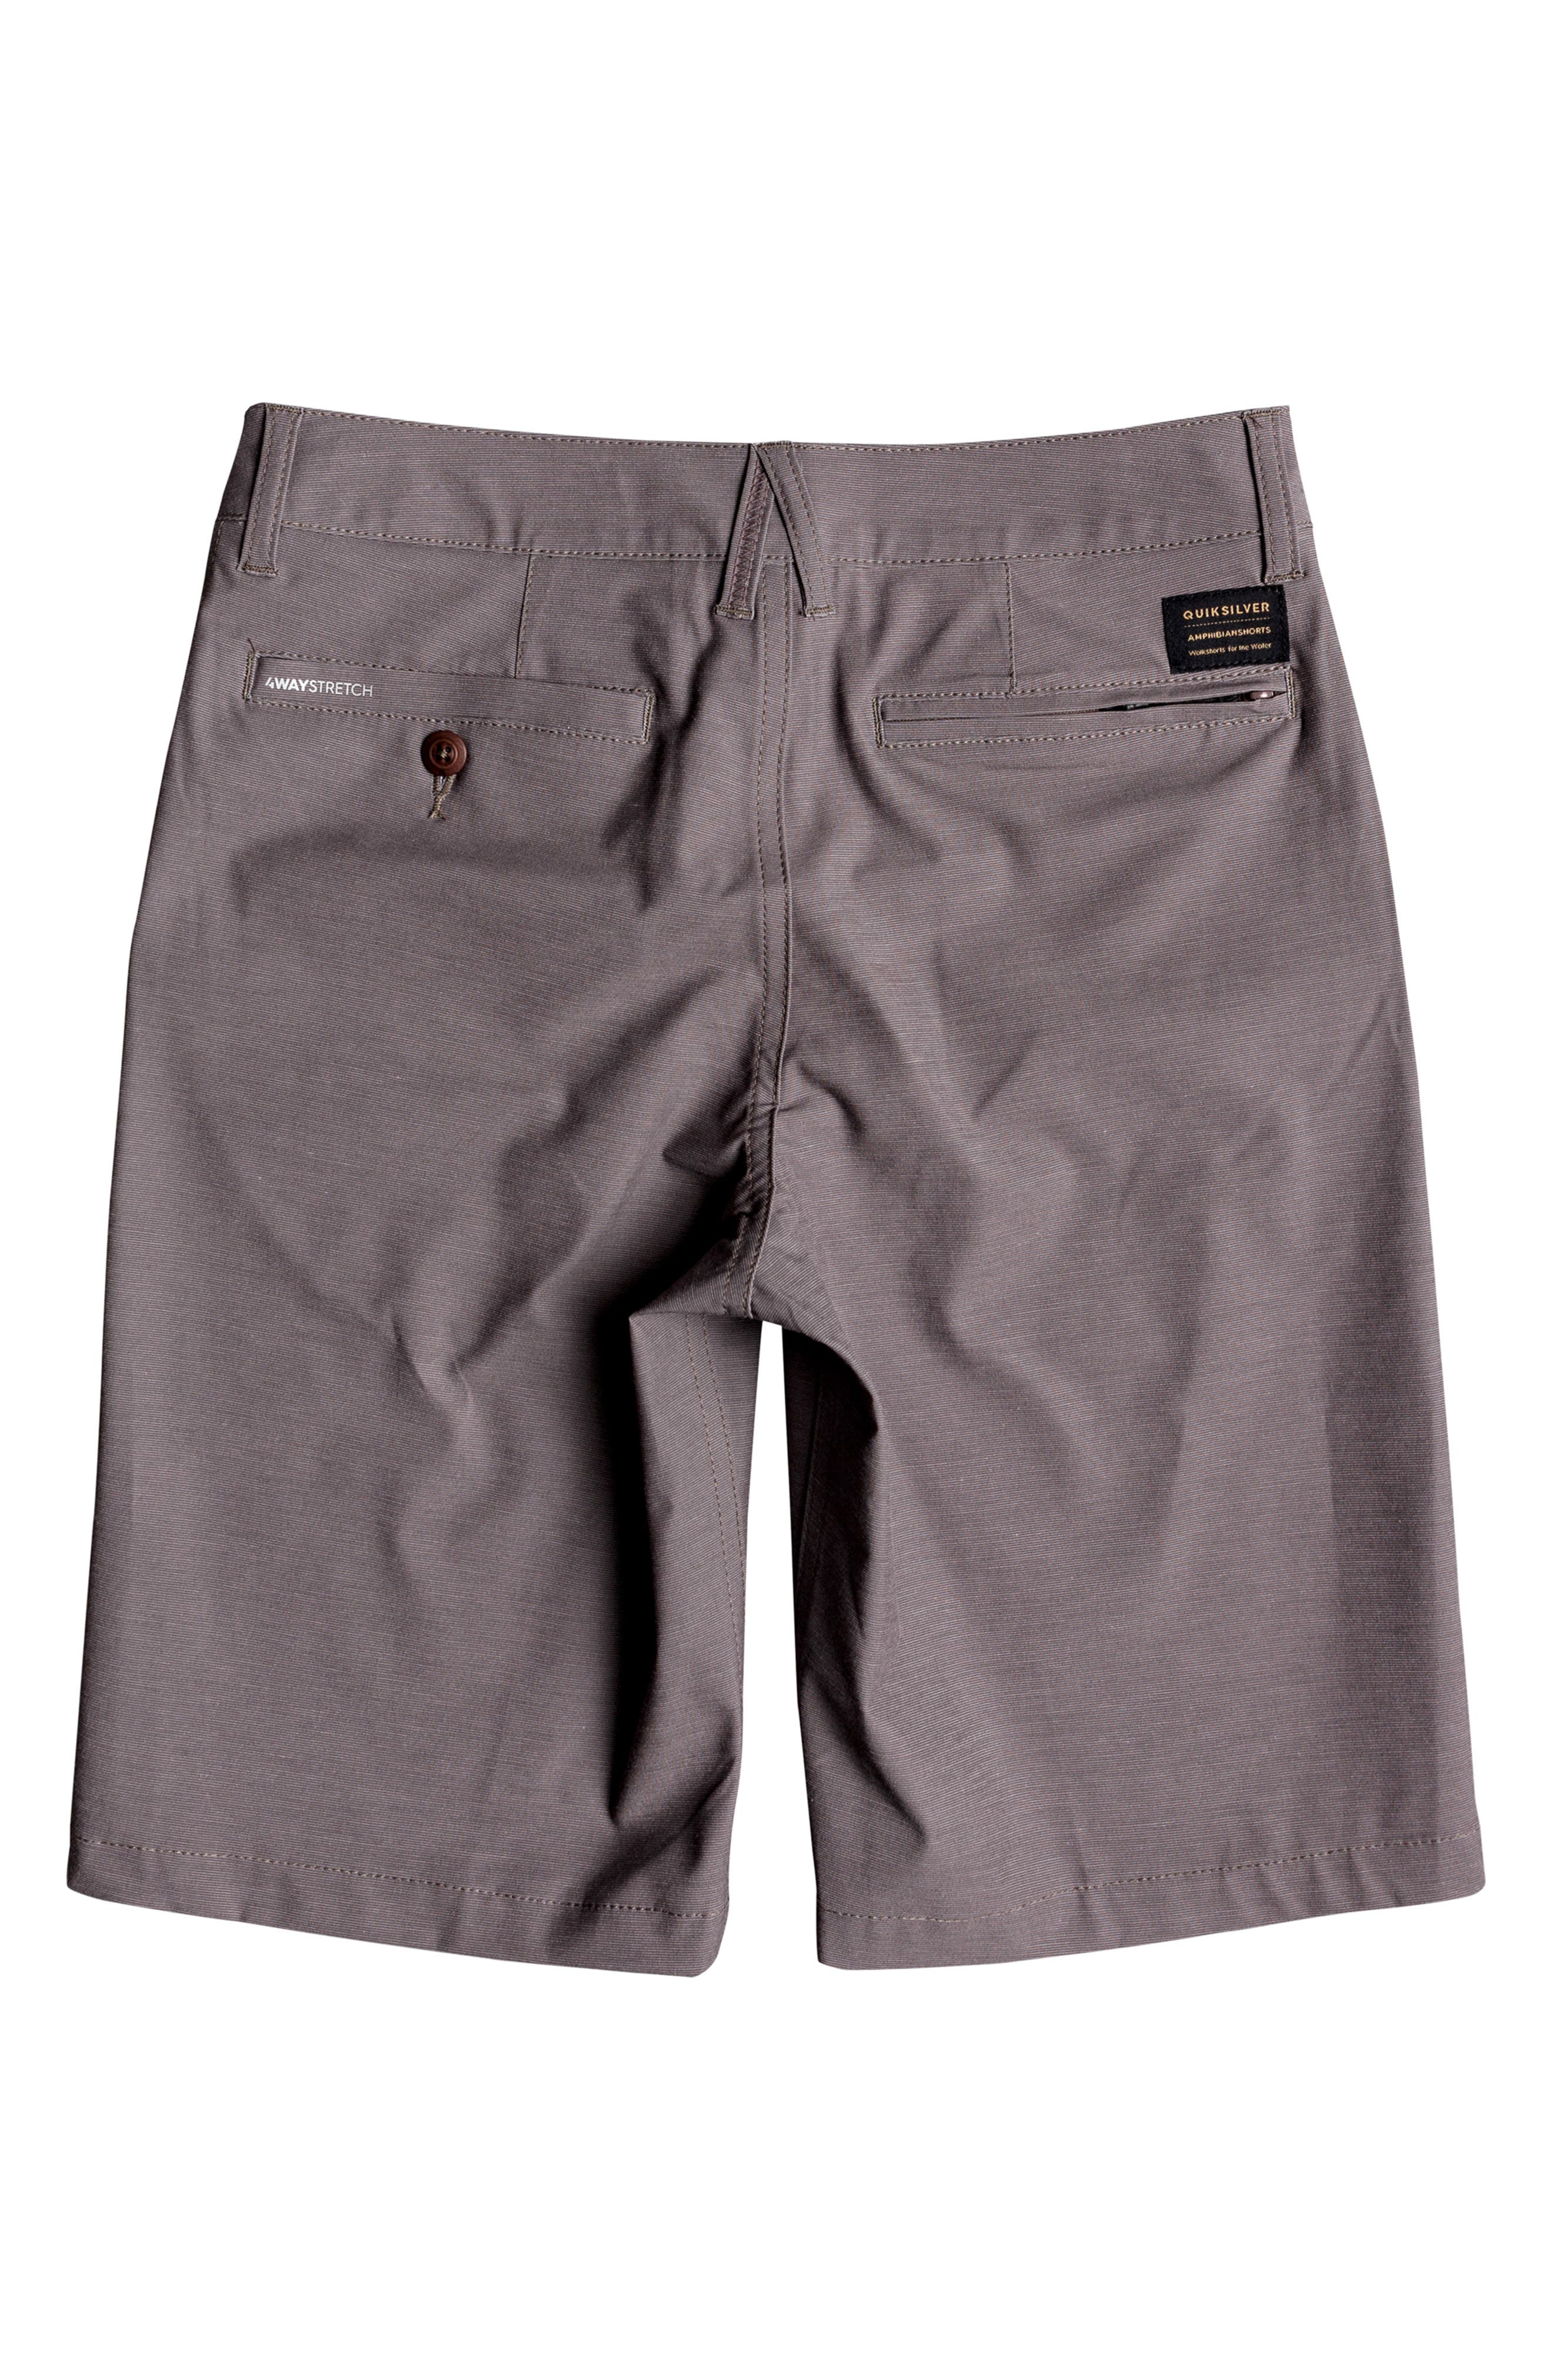 Union Heather Amphibian Hybrid Shorts,                             Alternate thumbnail 2, color,                             FALCON